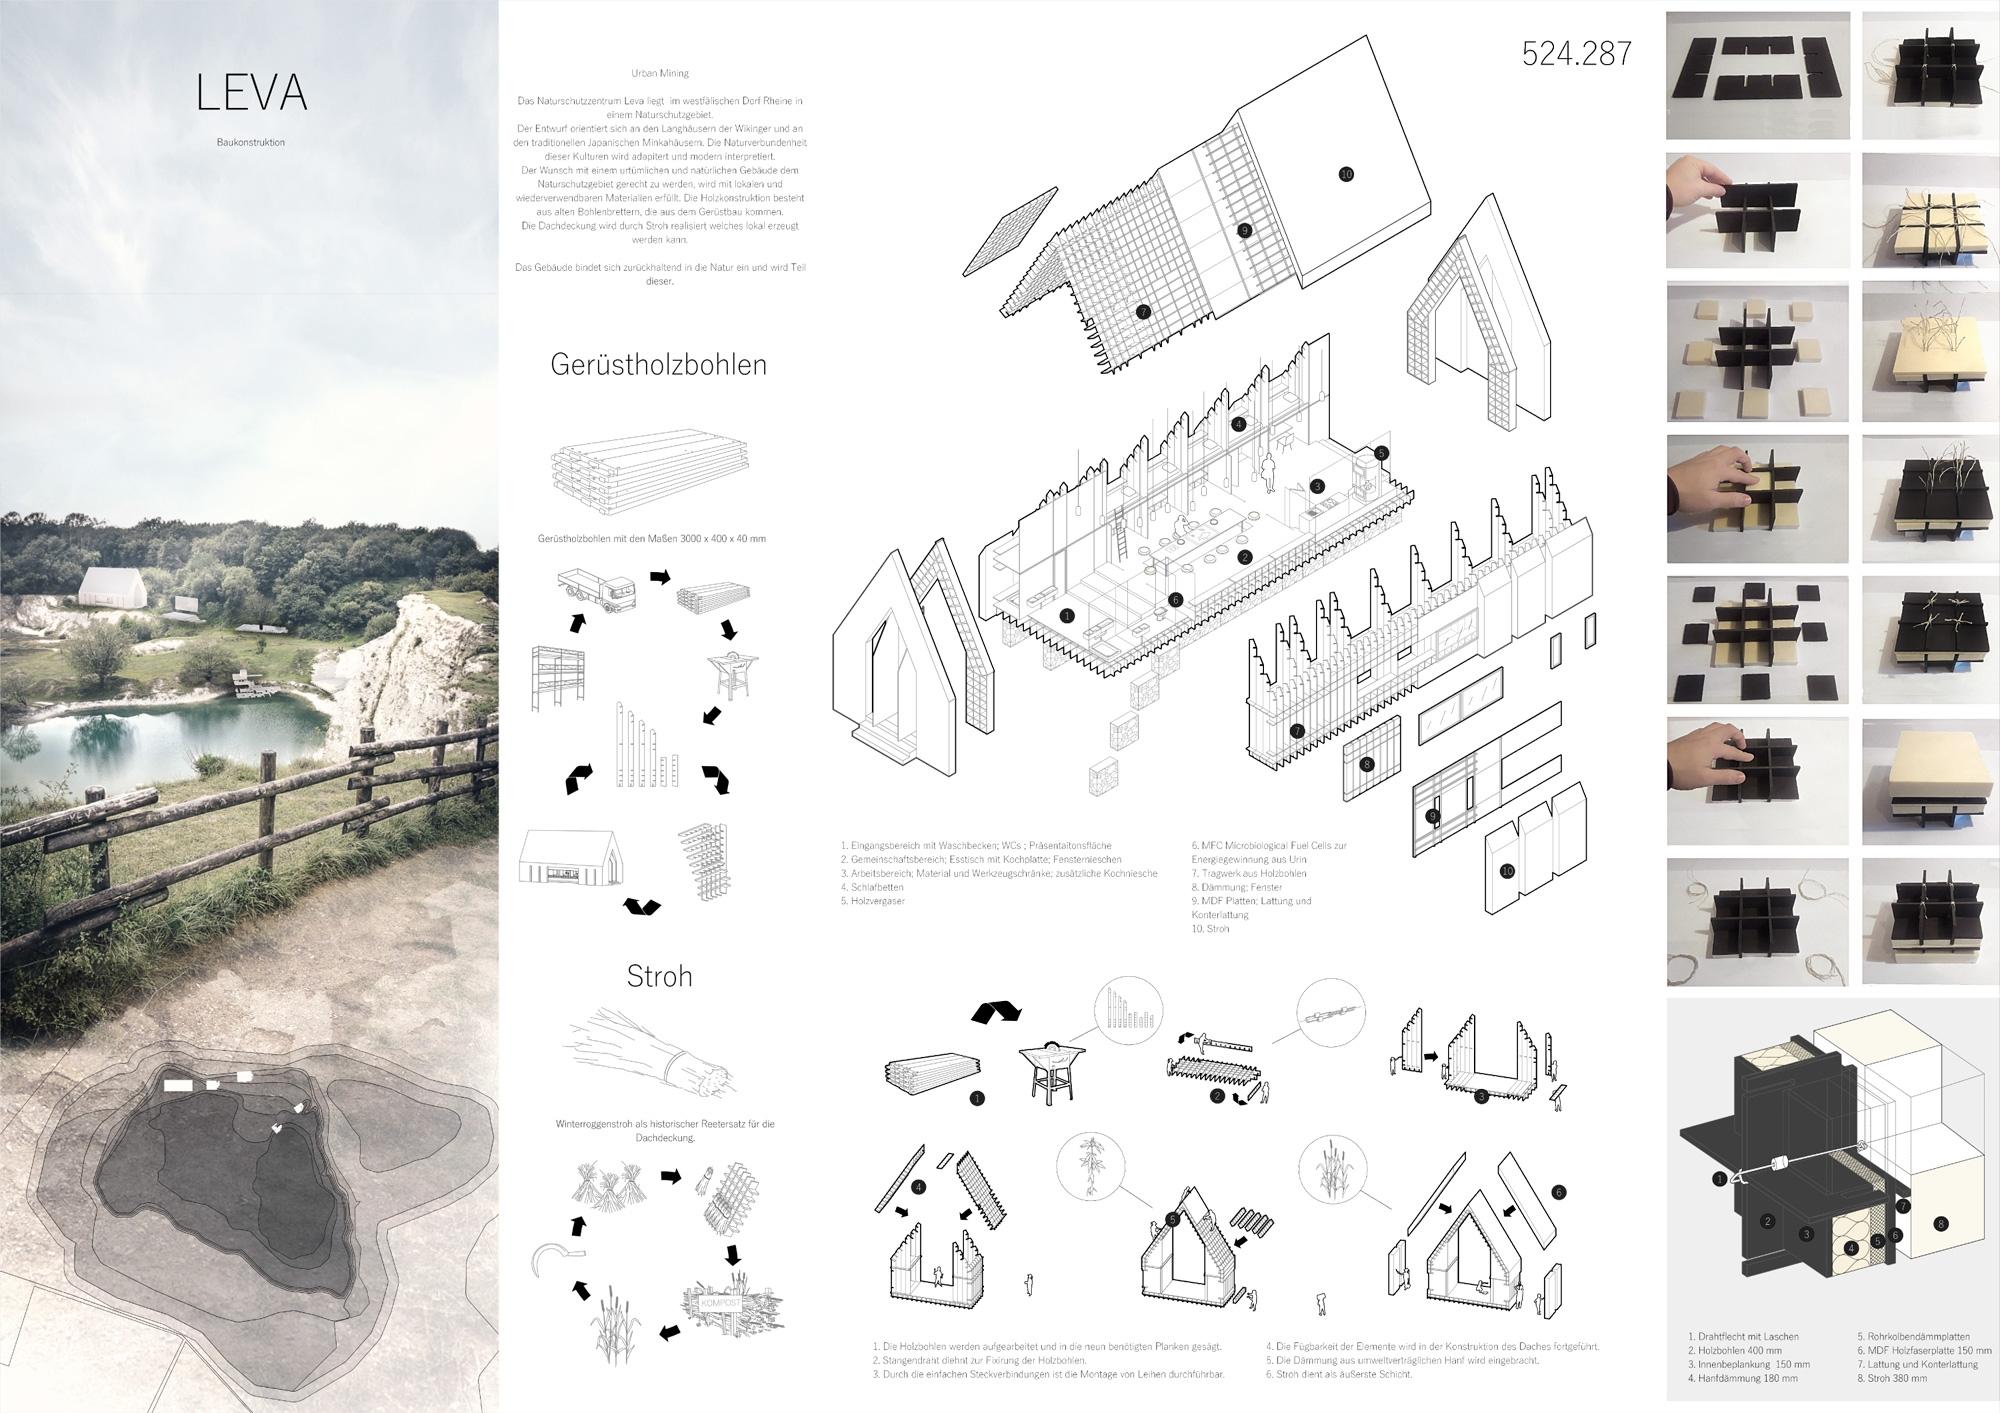 Ergebnis: Design for Urban Mining - Naturschutzzent...competitionline